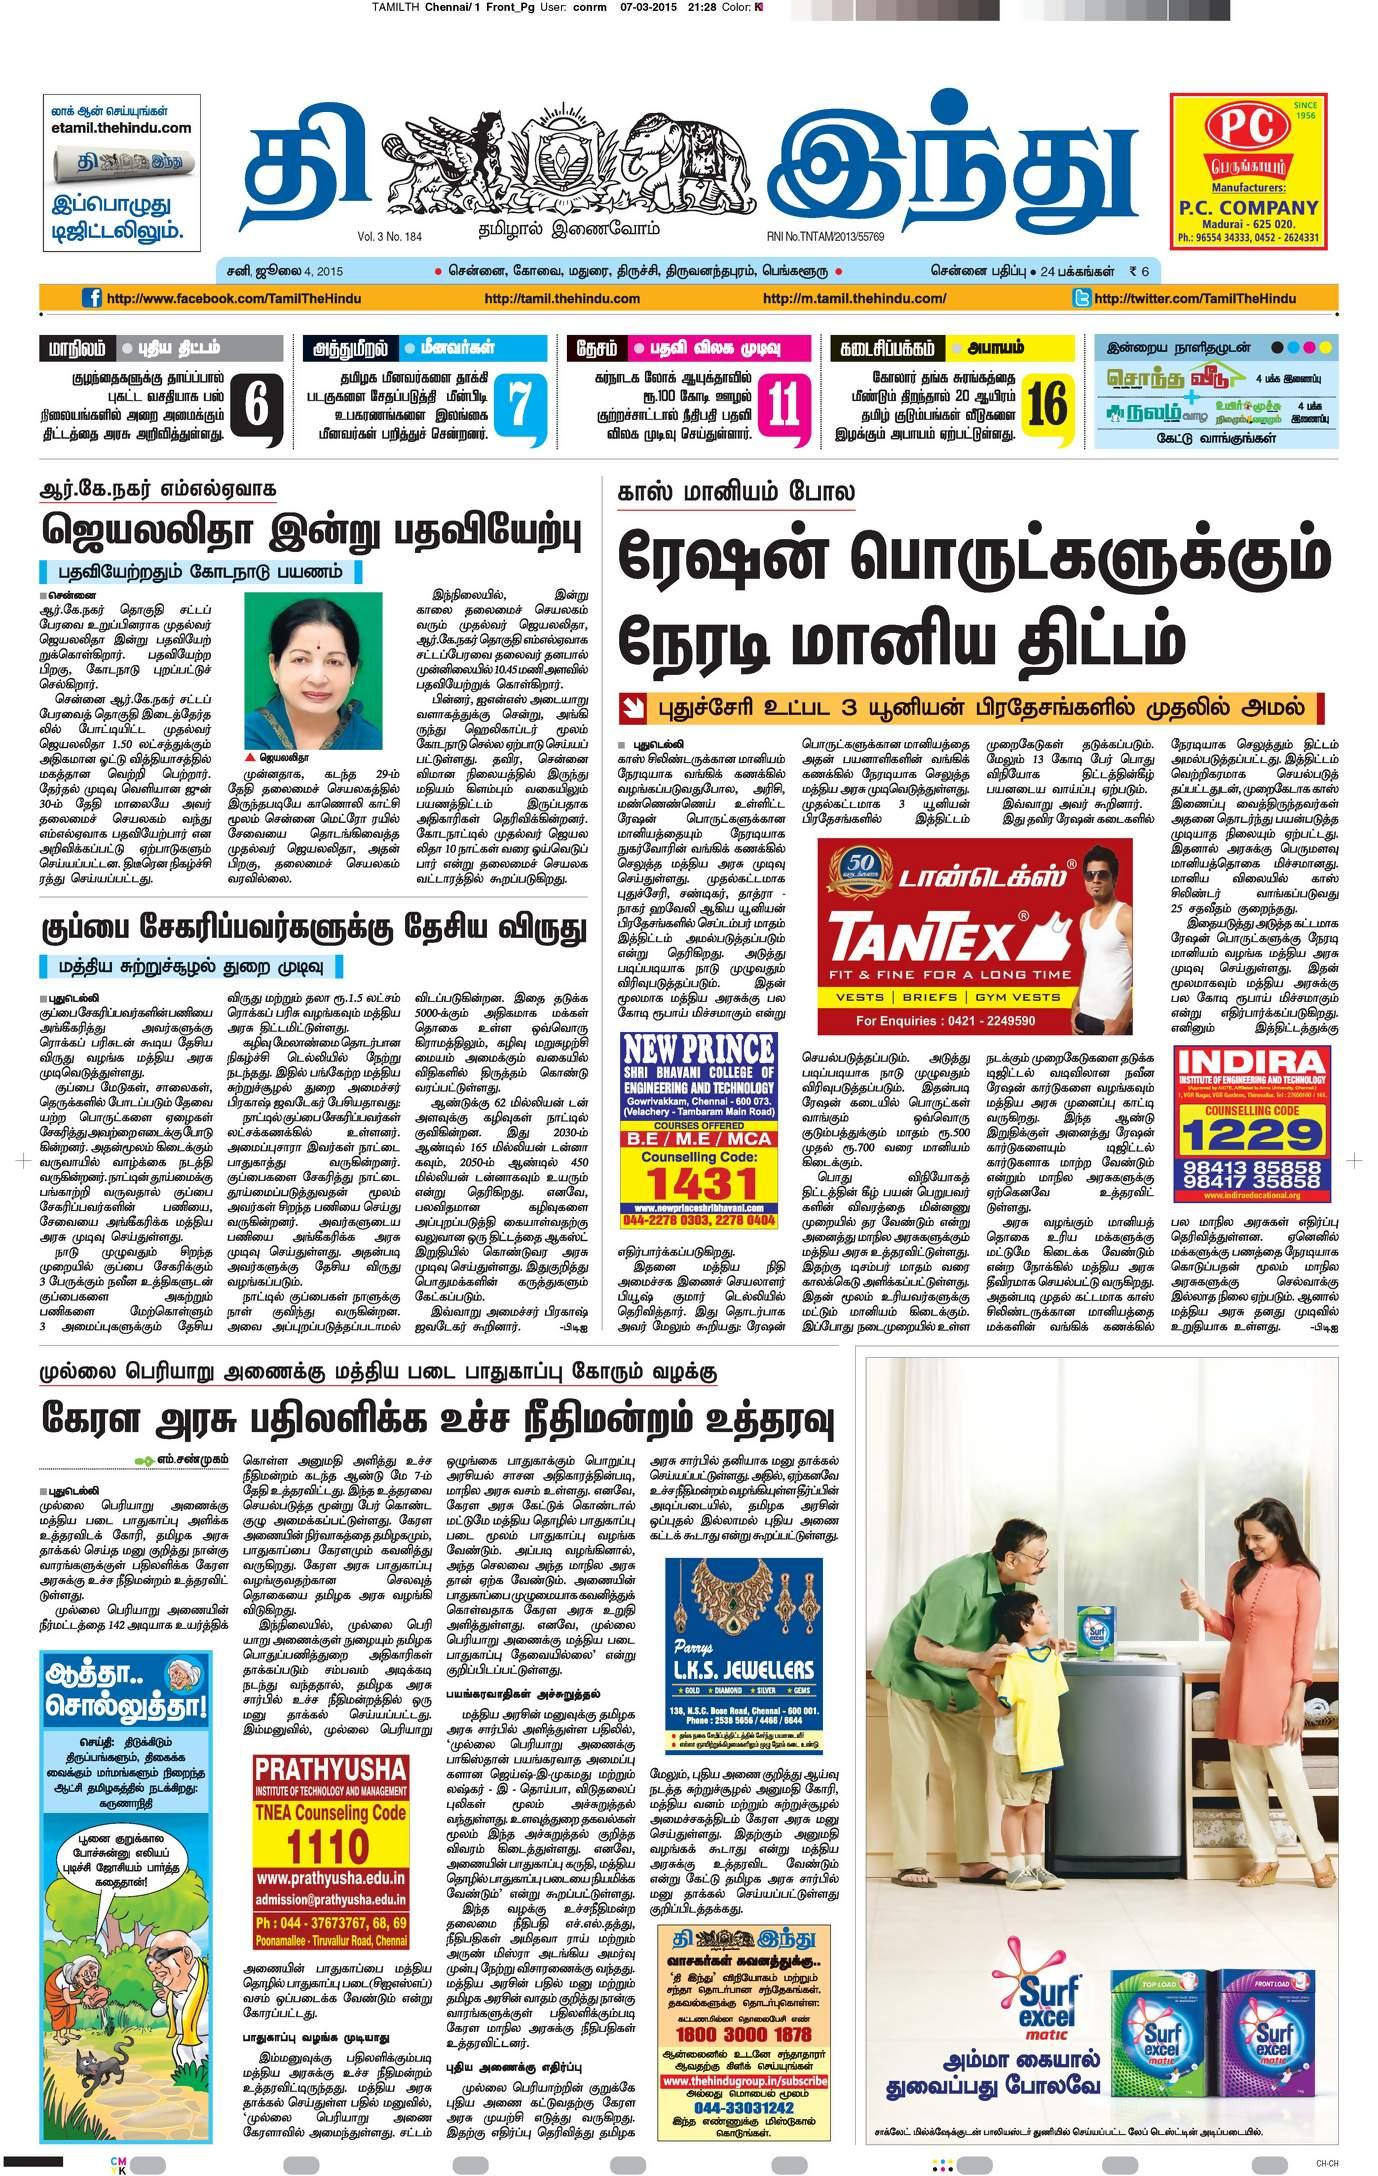 020 Hindu Tamil Essay Example Surprising Hinduism Questions Muslim Ekta In Hindi And Buddhism Introduction Full